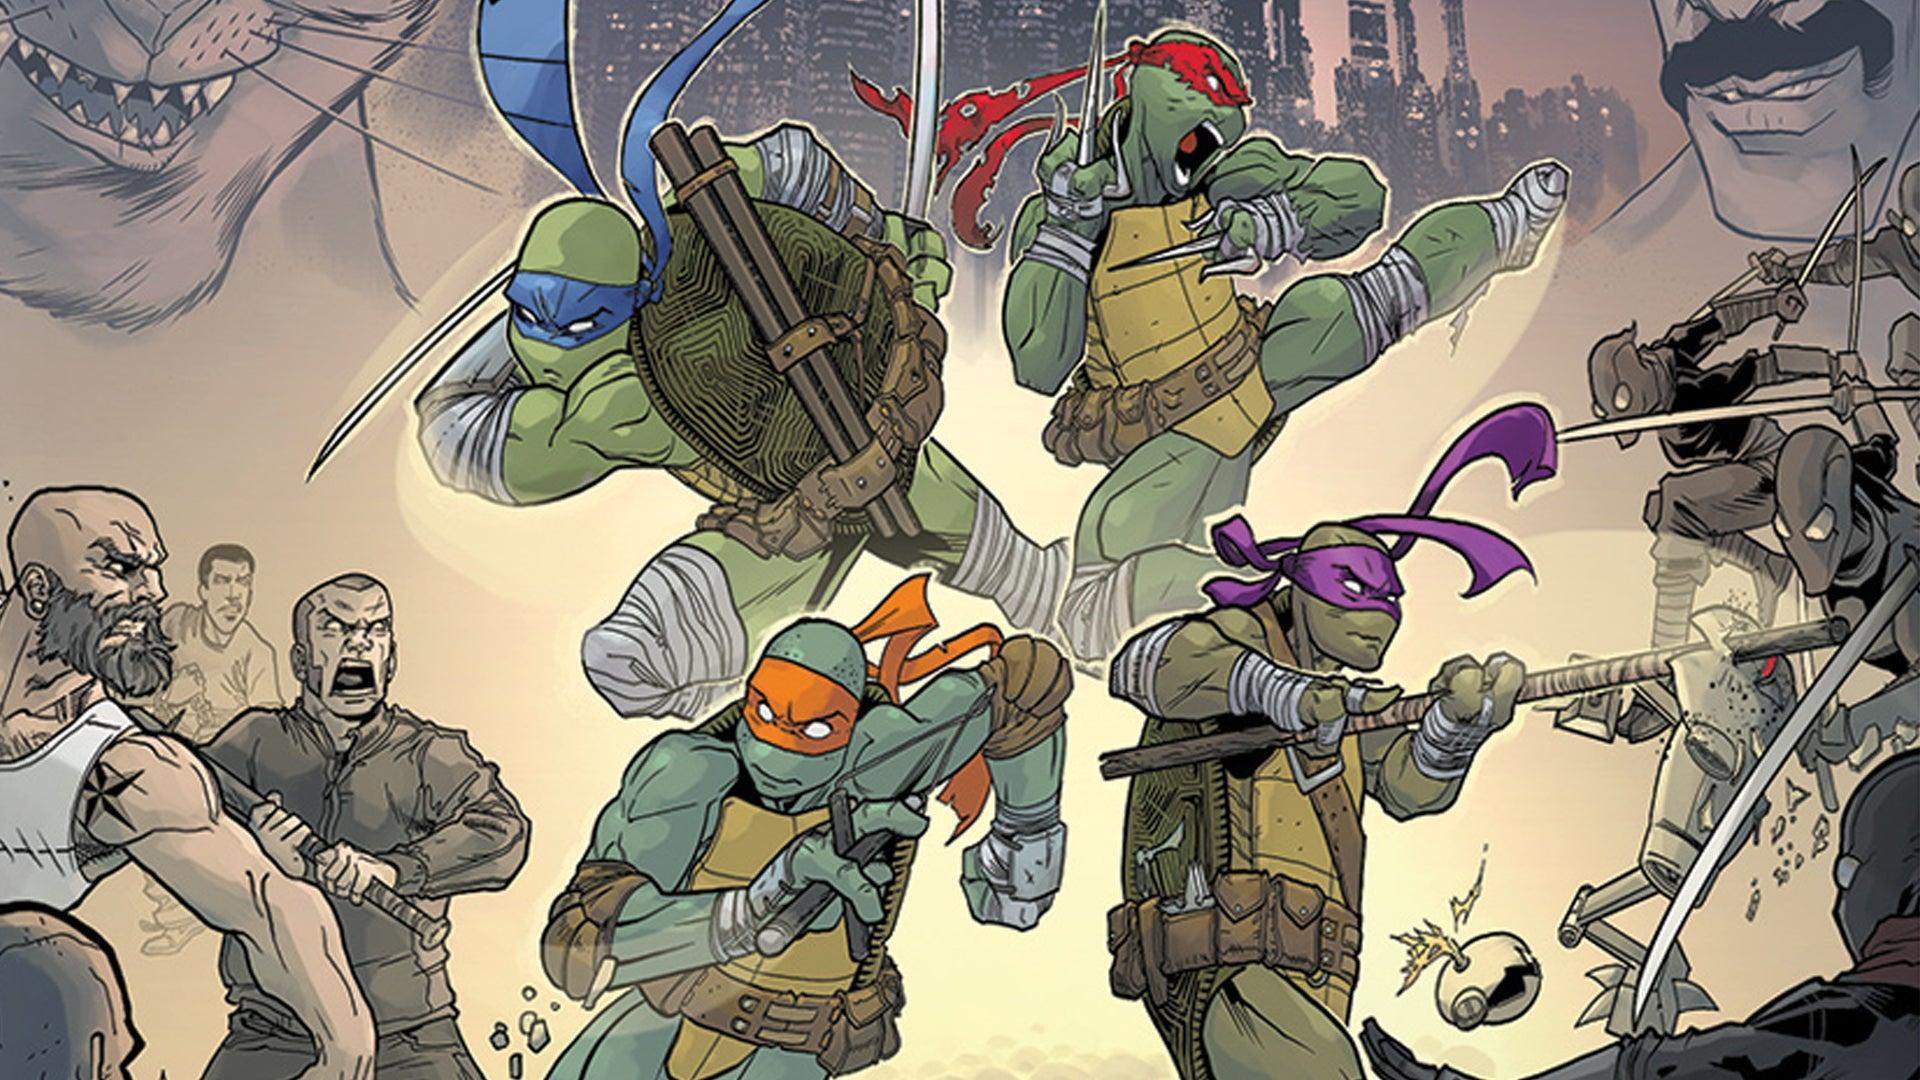 teenage-mutant-ninja-turtles-adventures-change-is-constant-board-game-box-art.jpg